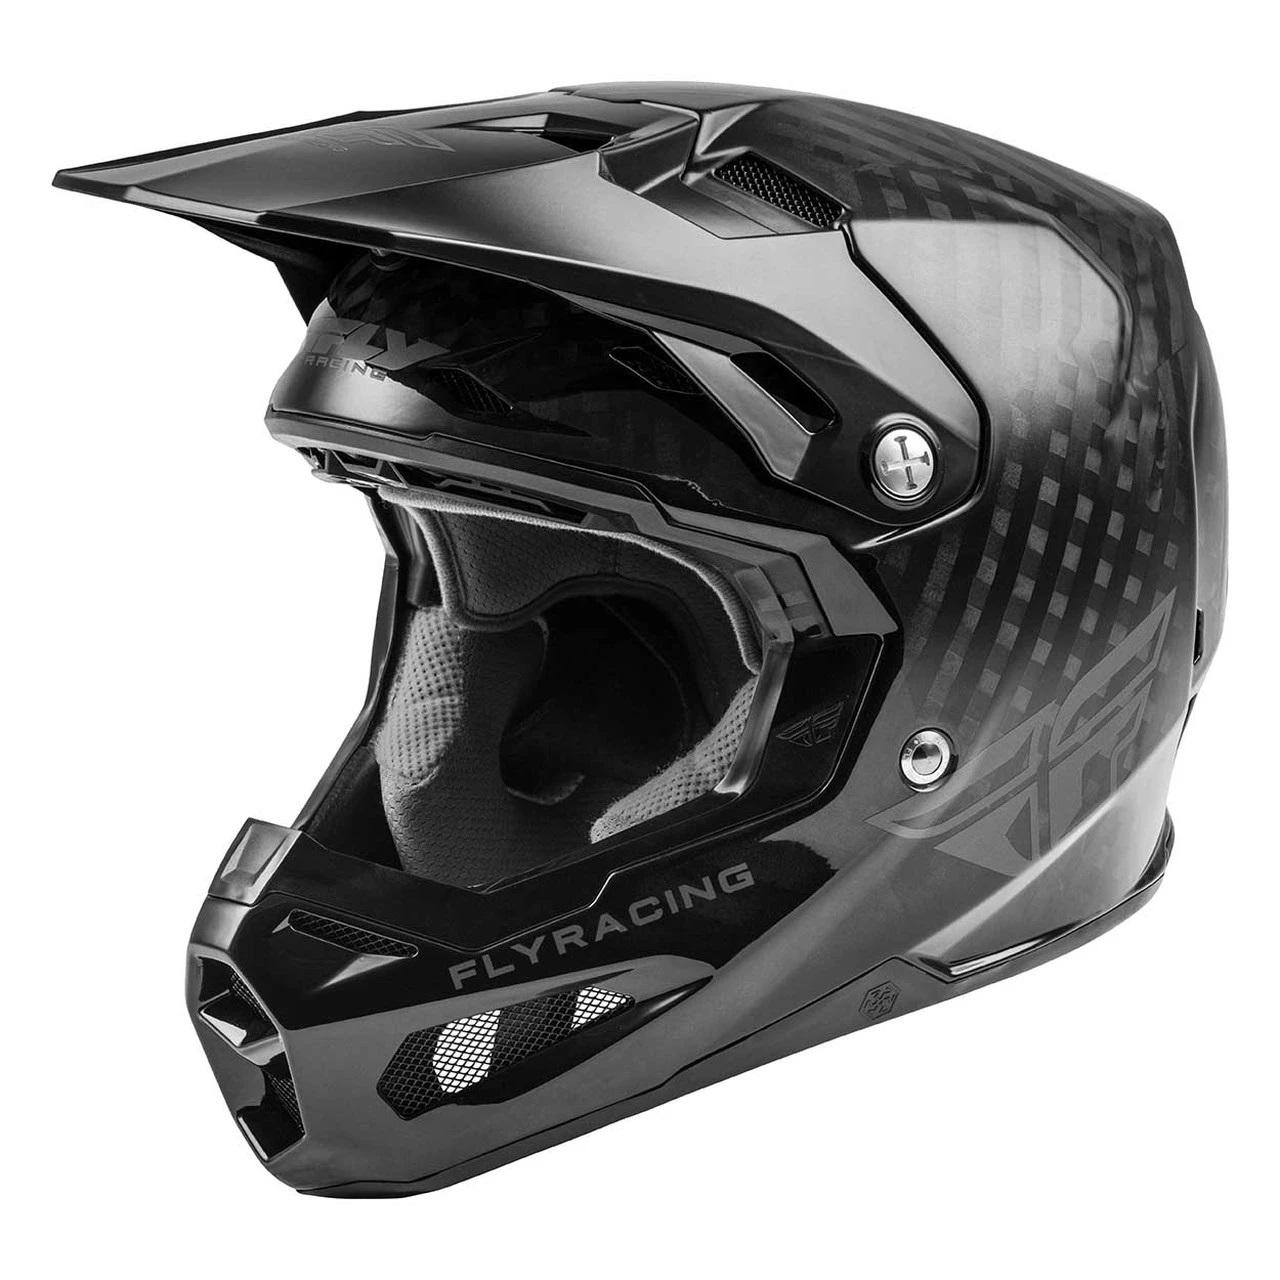 Fly Formula Vector Helmet - Black Image